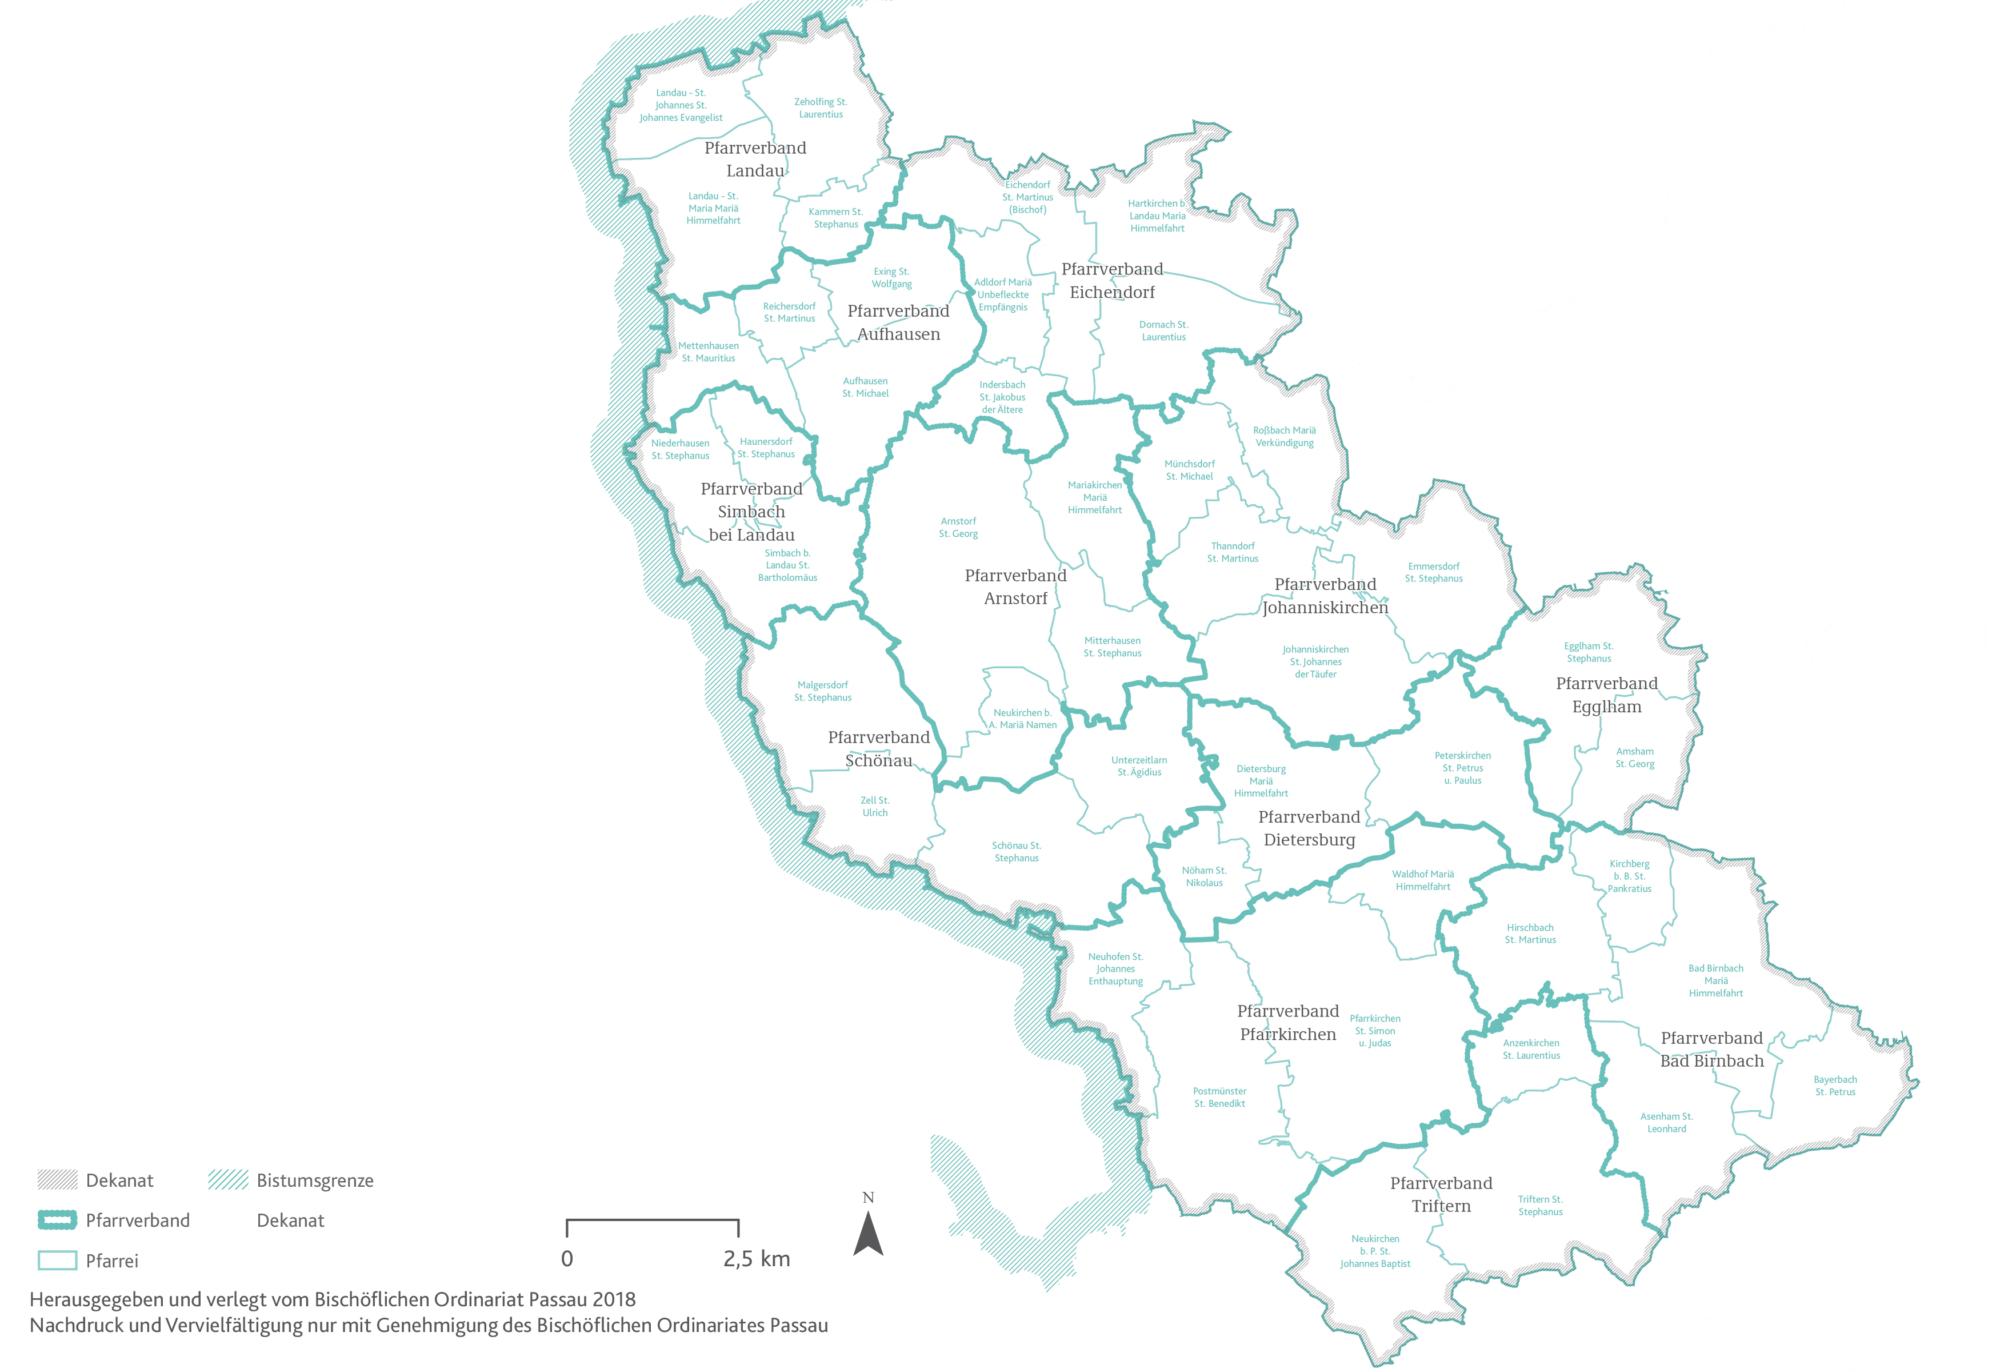 2021 Bistum Pfarreien Dekanate Pfarrkirchen